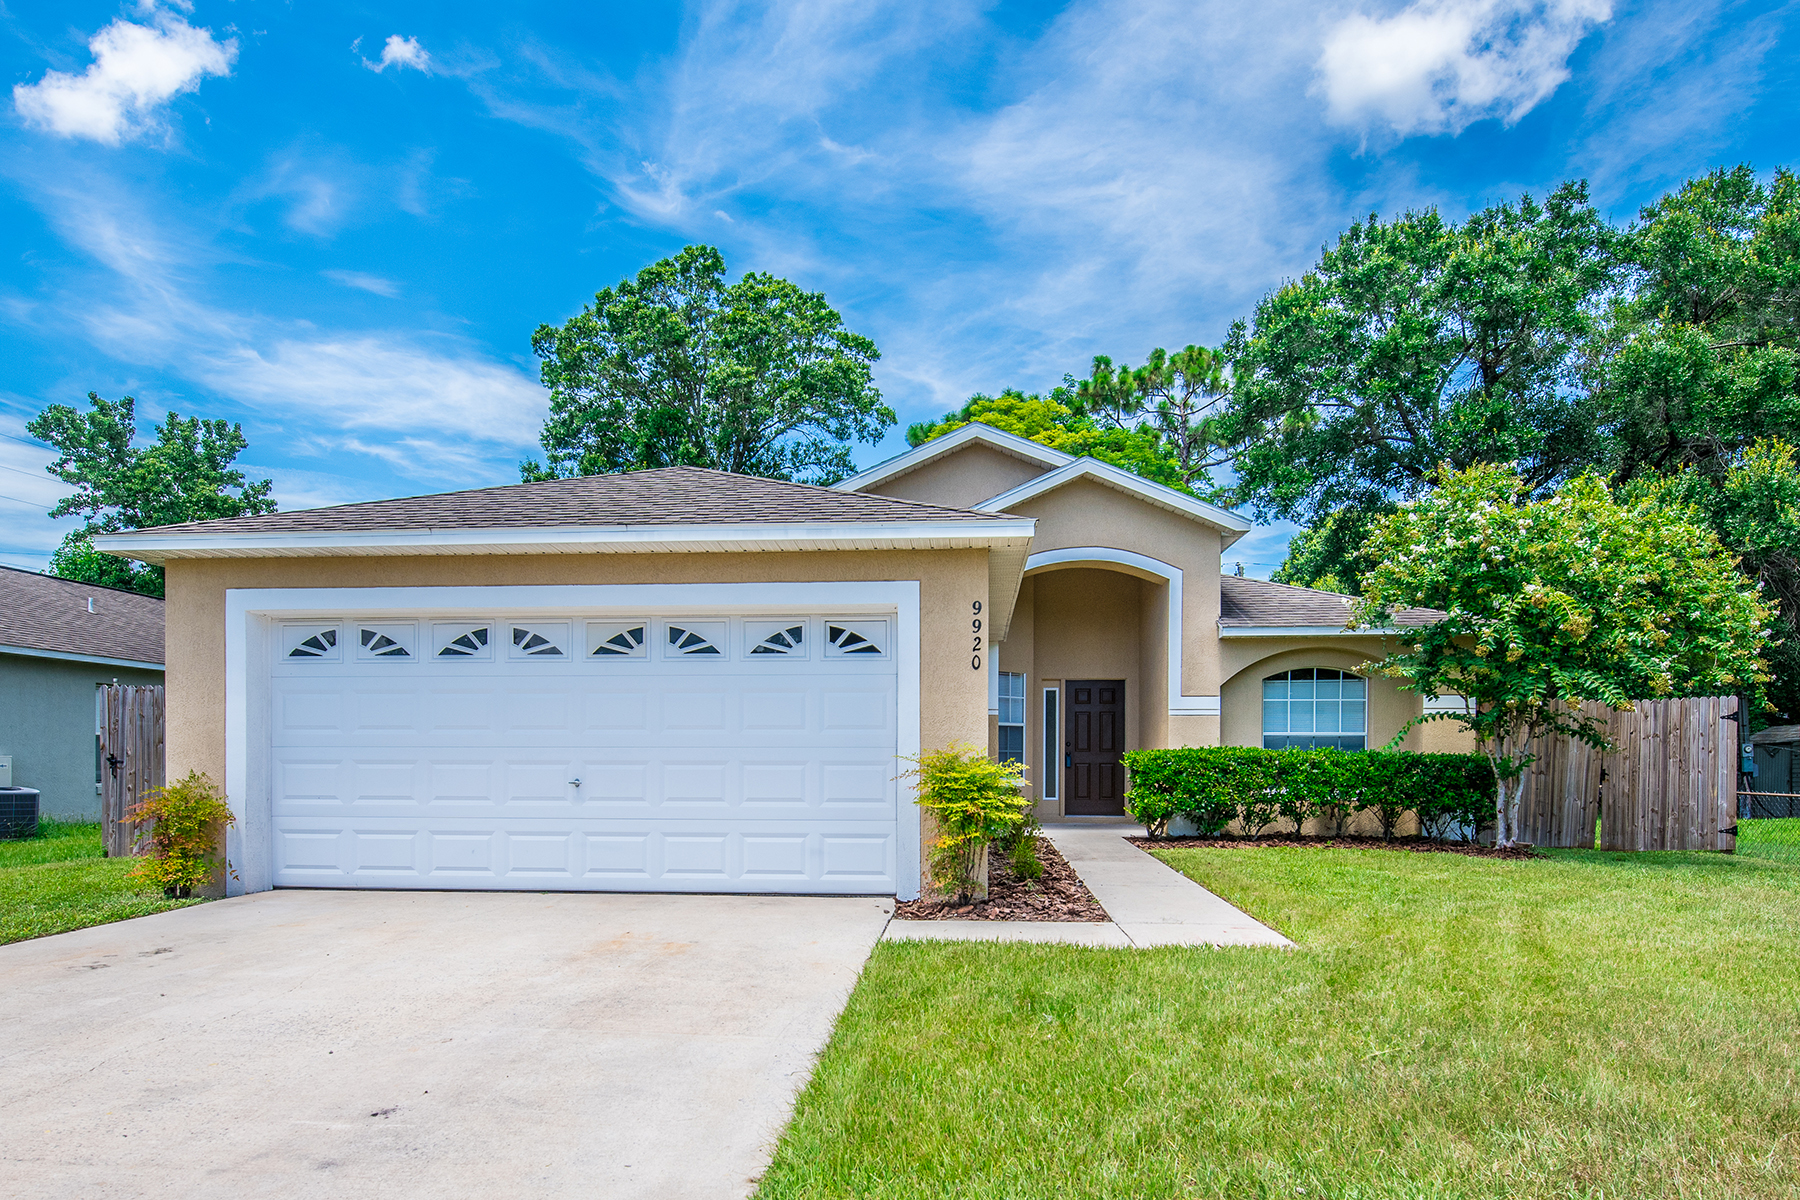 Single Family Home for Sale at ORLANDO 9920 4th Ave Orlando, Florida, 32824 United States